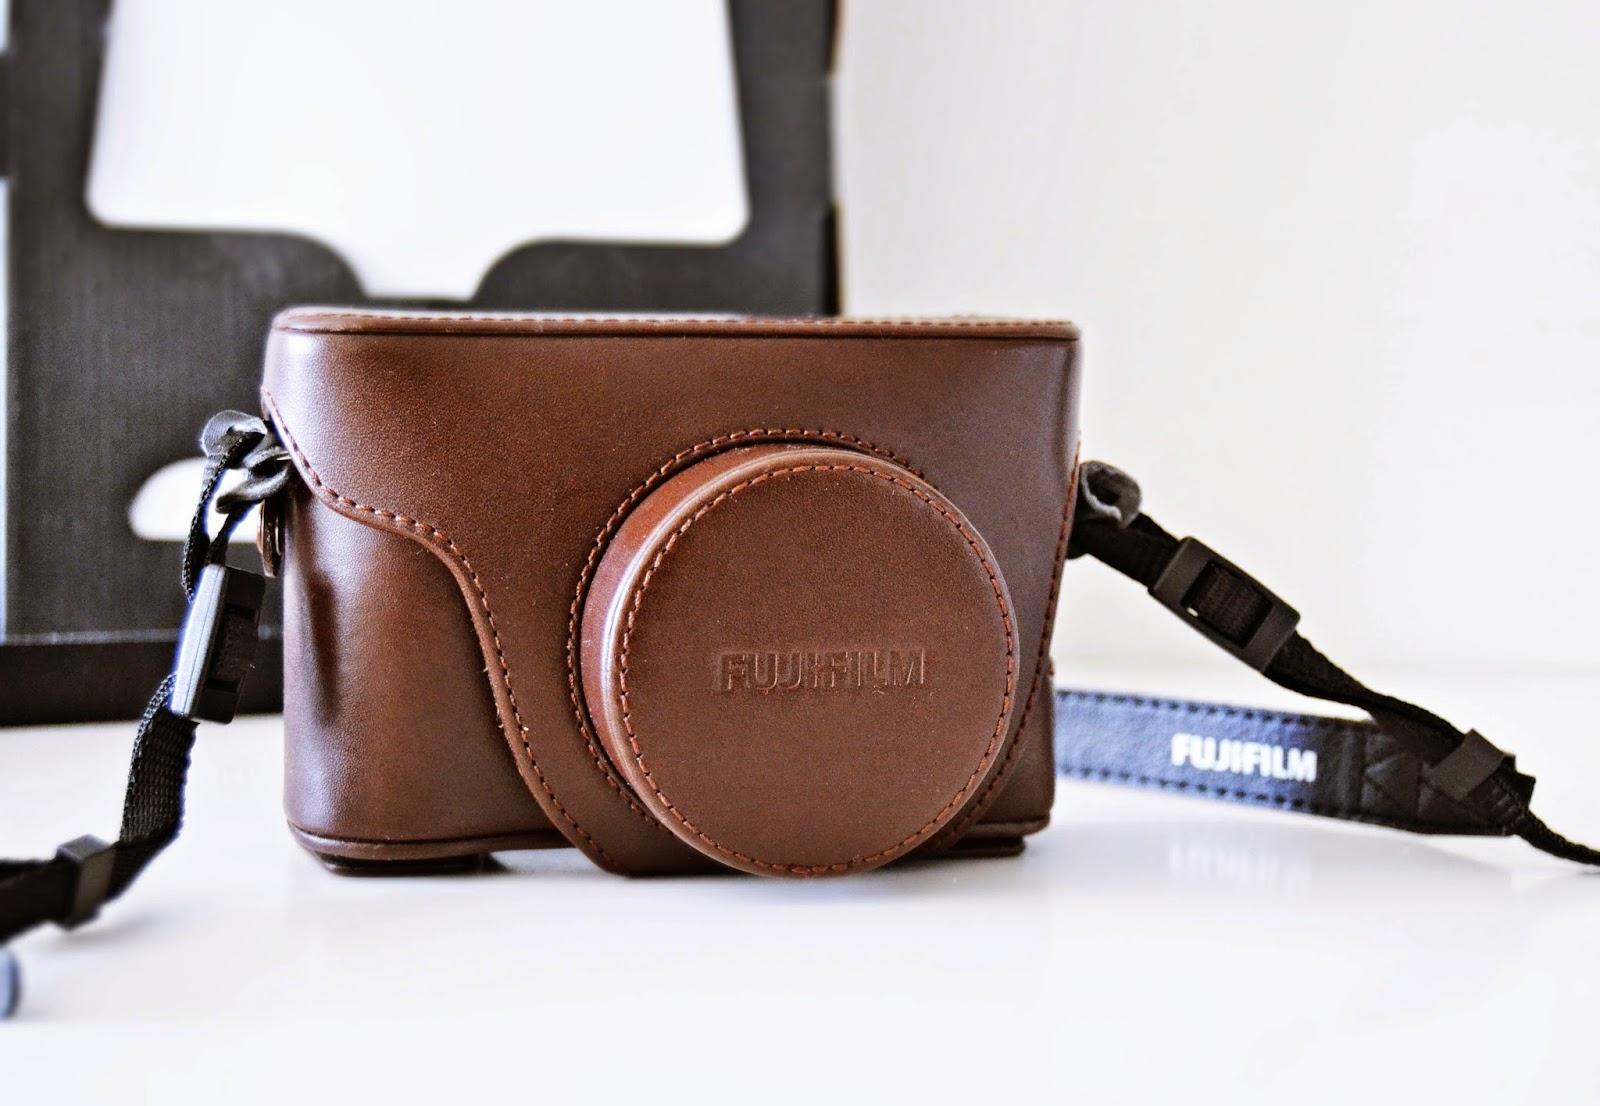 Fujifilm X30 patrocinador Blog Mi Boda #esFujifilmX